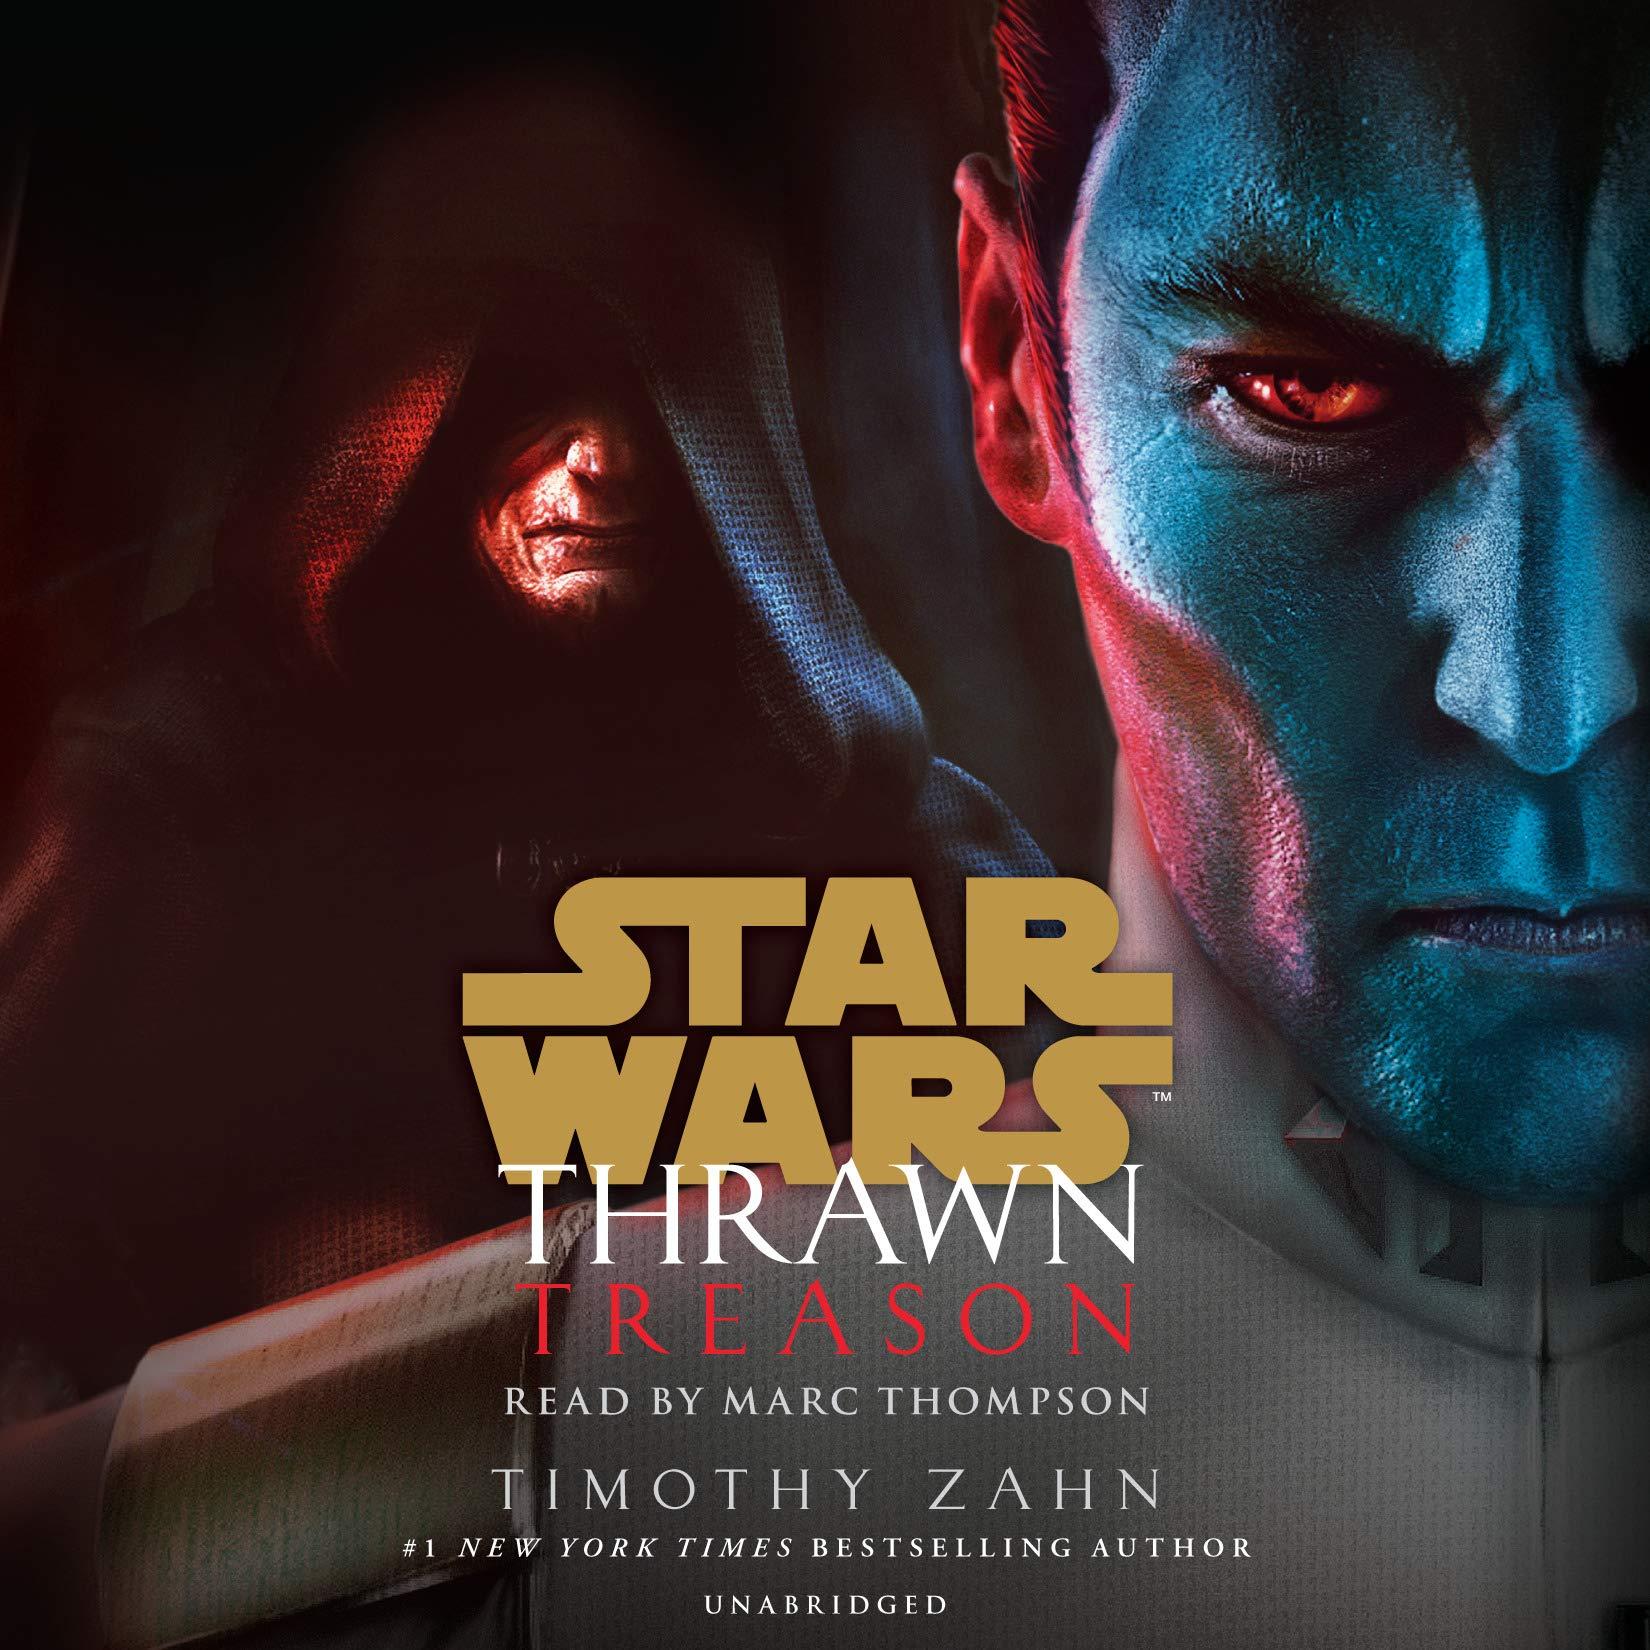 Thrawn - Treason (Book 3) - Timothy Zahn